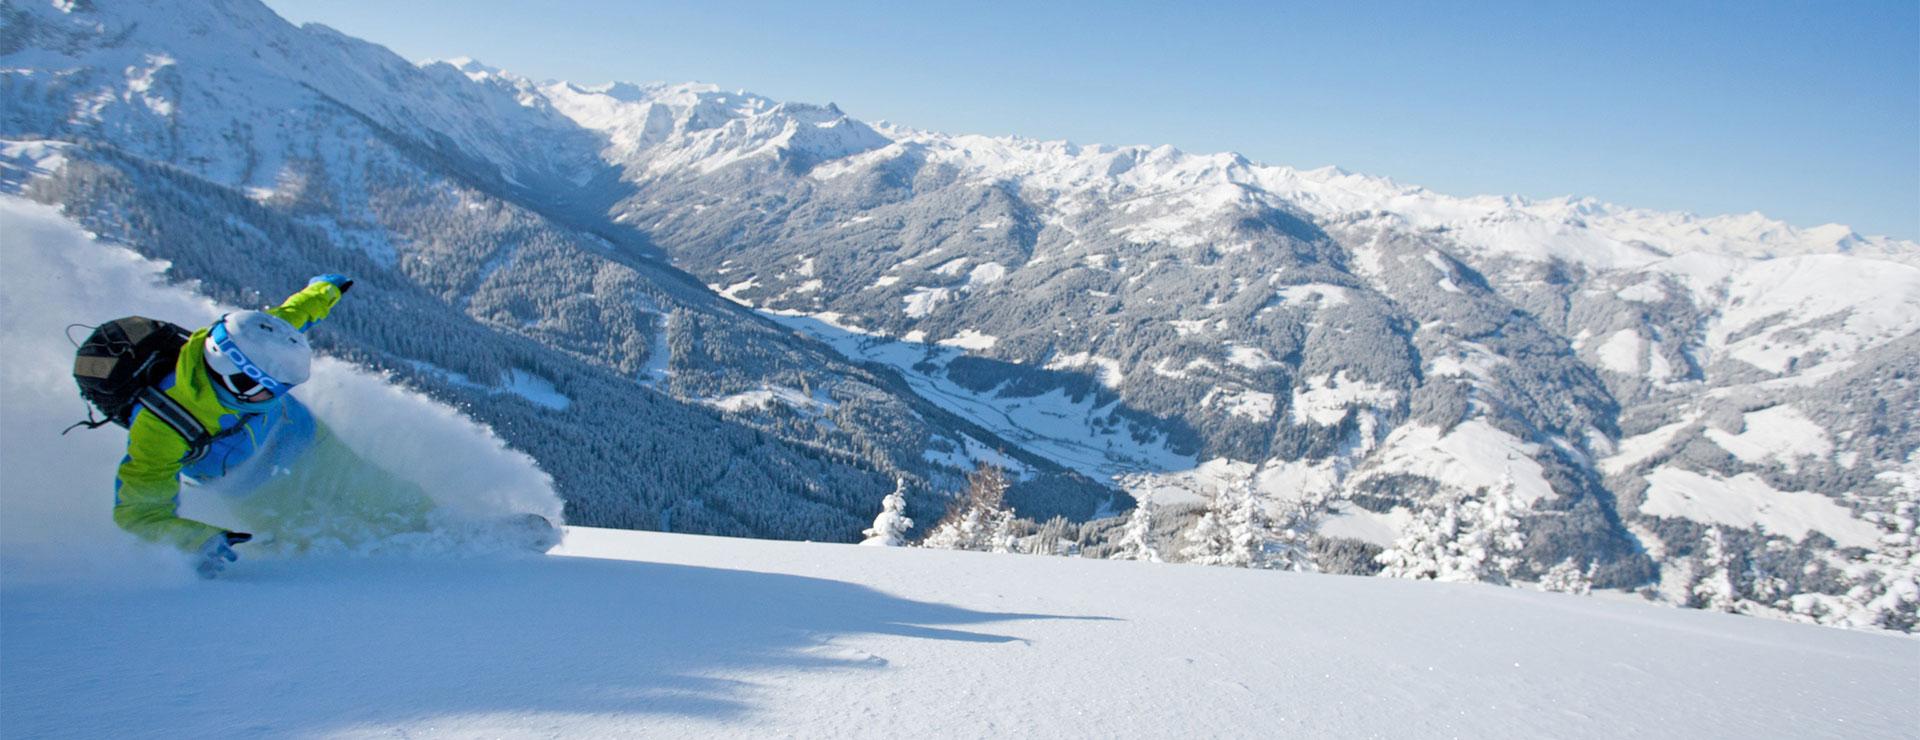 Snowboarden - Winterurlaub in Wagrain